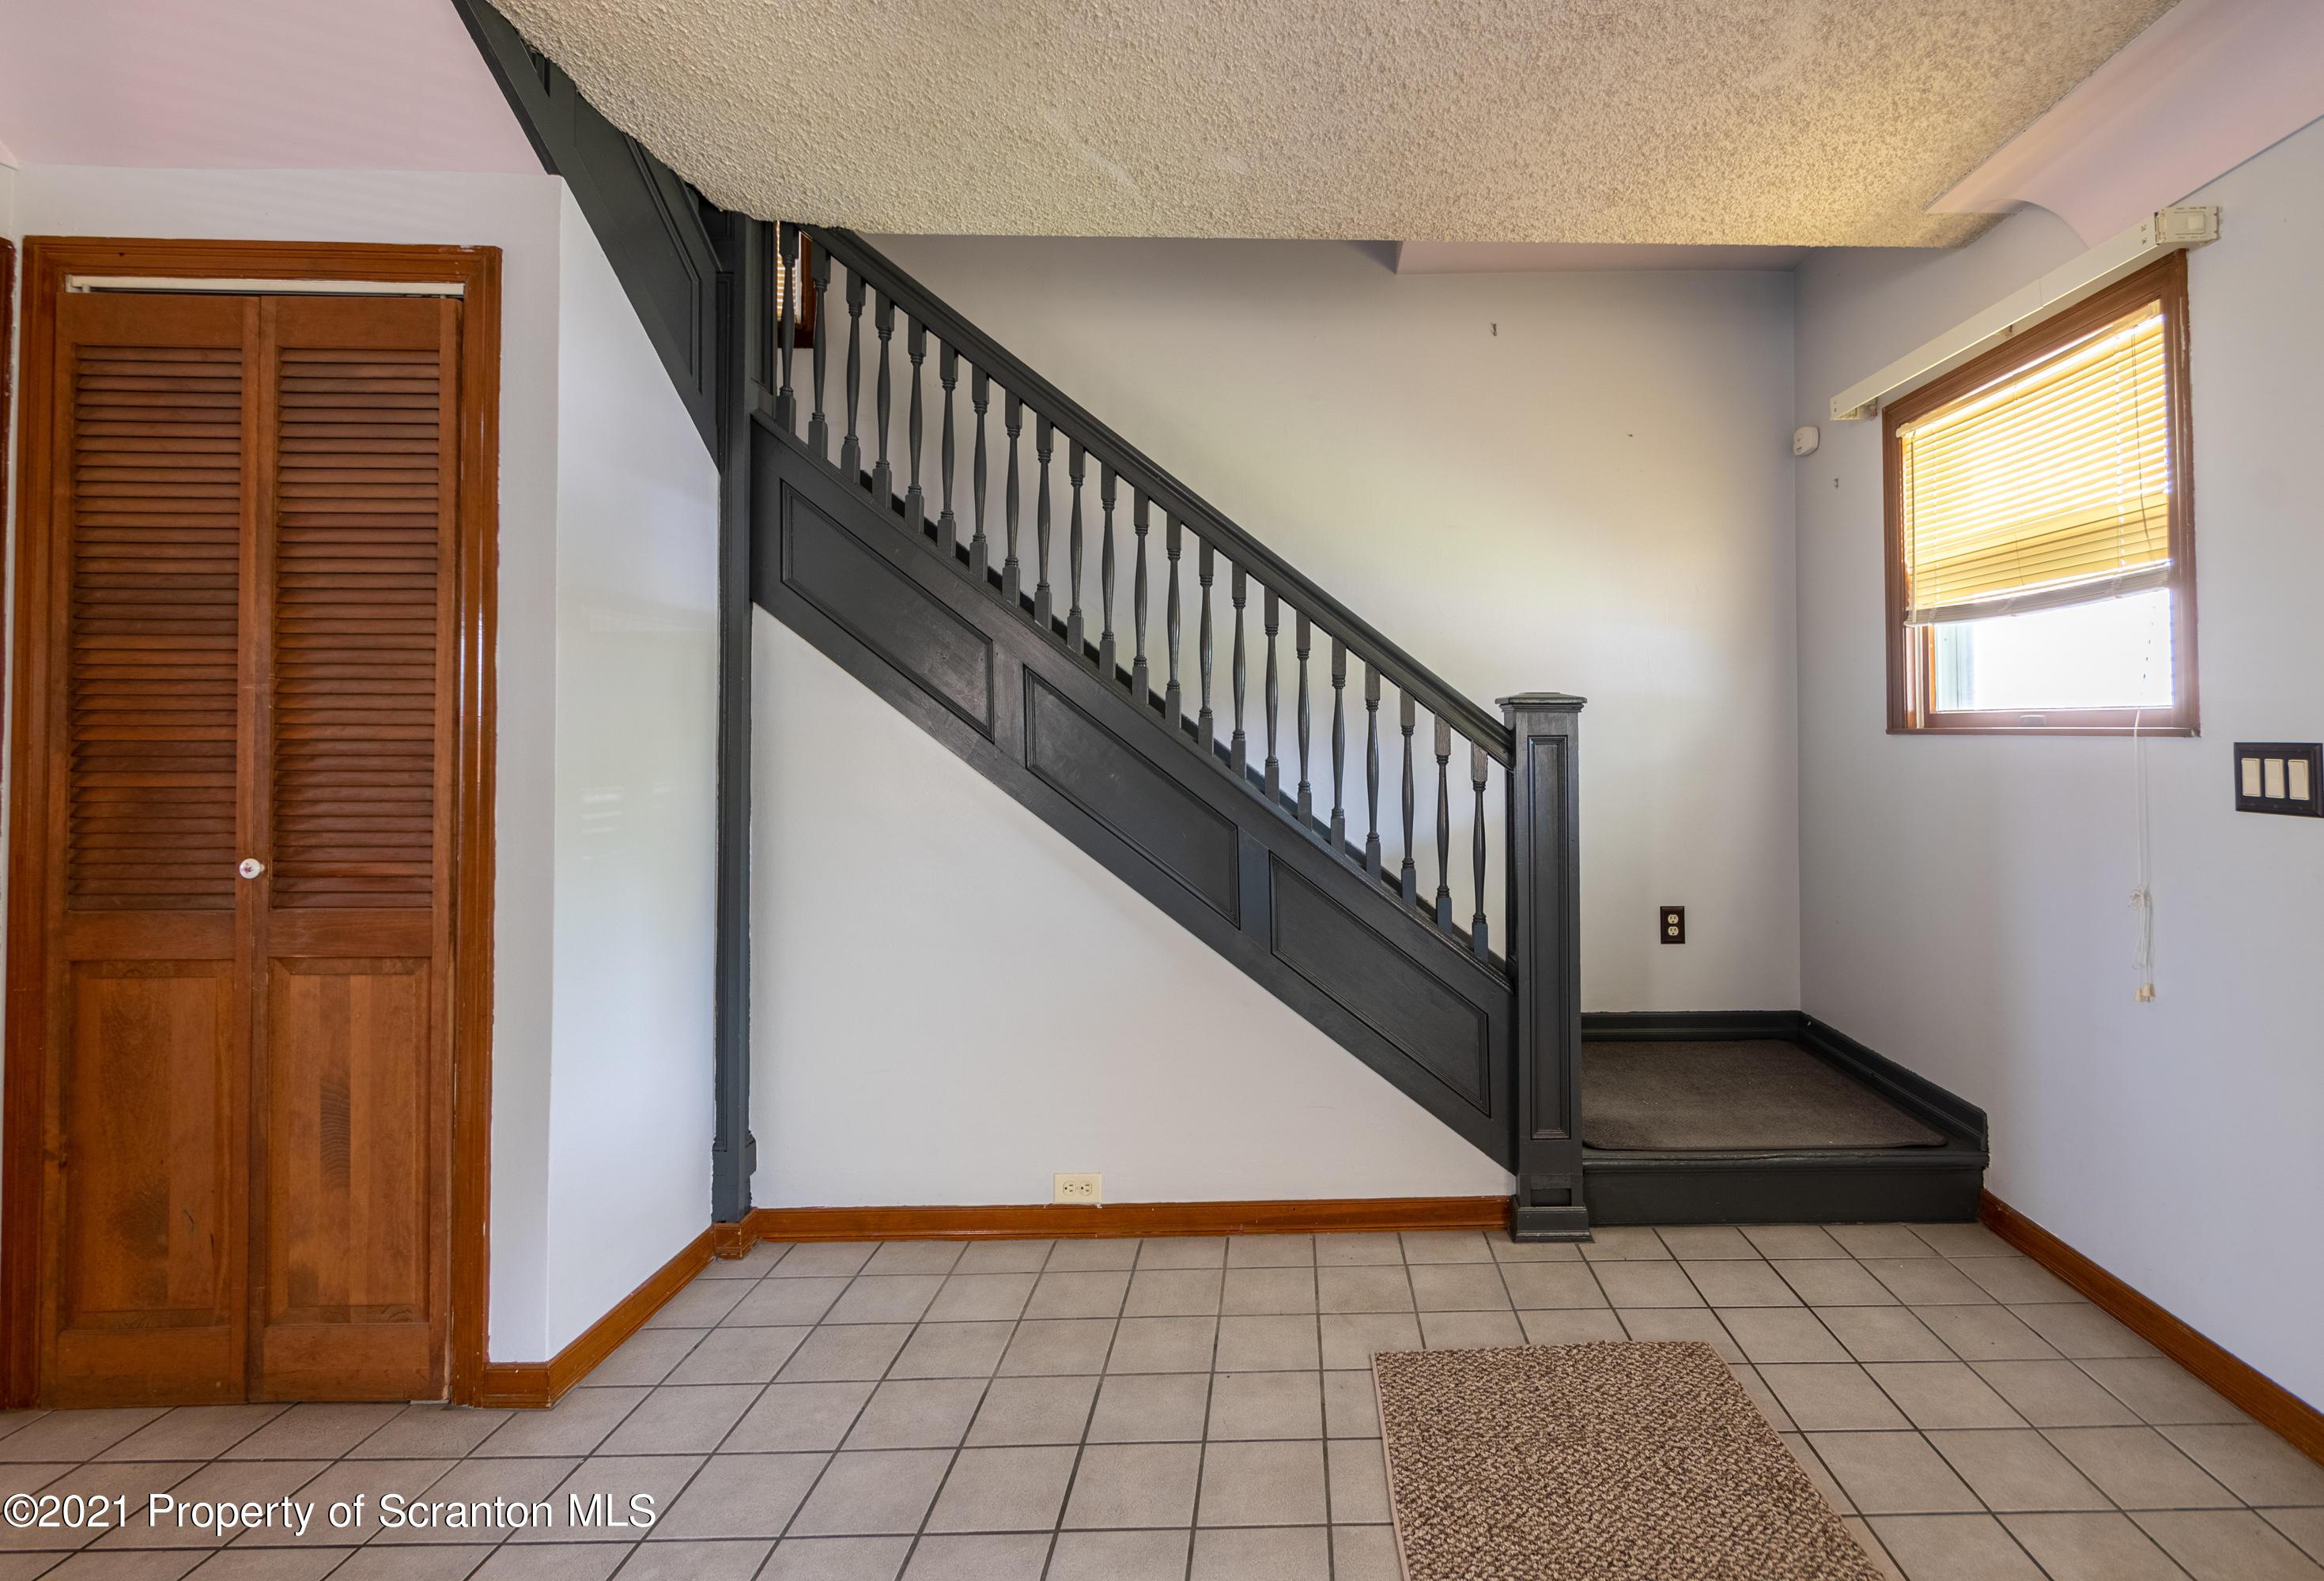 821 Prescott Ave, Scranton, Pennsylvania 18510, 3 Bedrooms Bedrooms, 5 Rooms Rooms,1 BathroomBathrooms,Single Family,For Sale,Prescott,21-2929